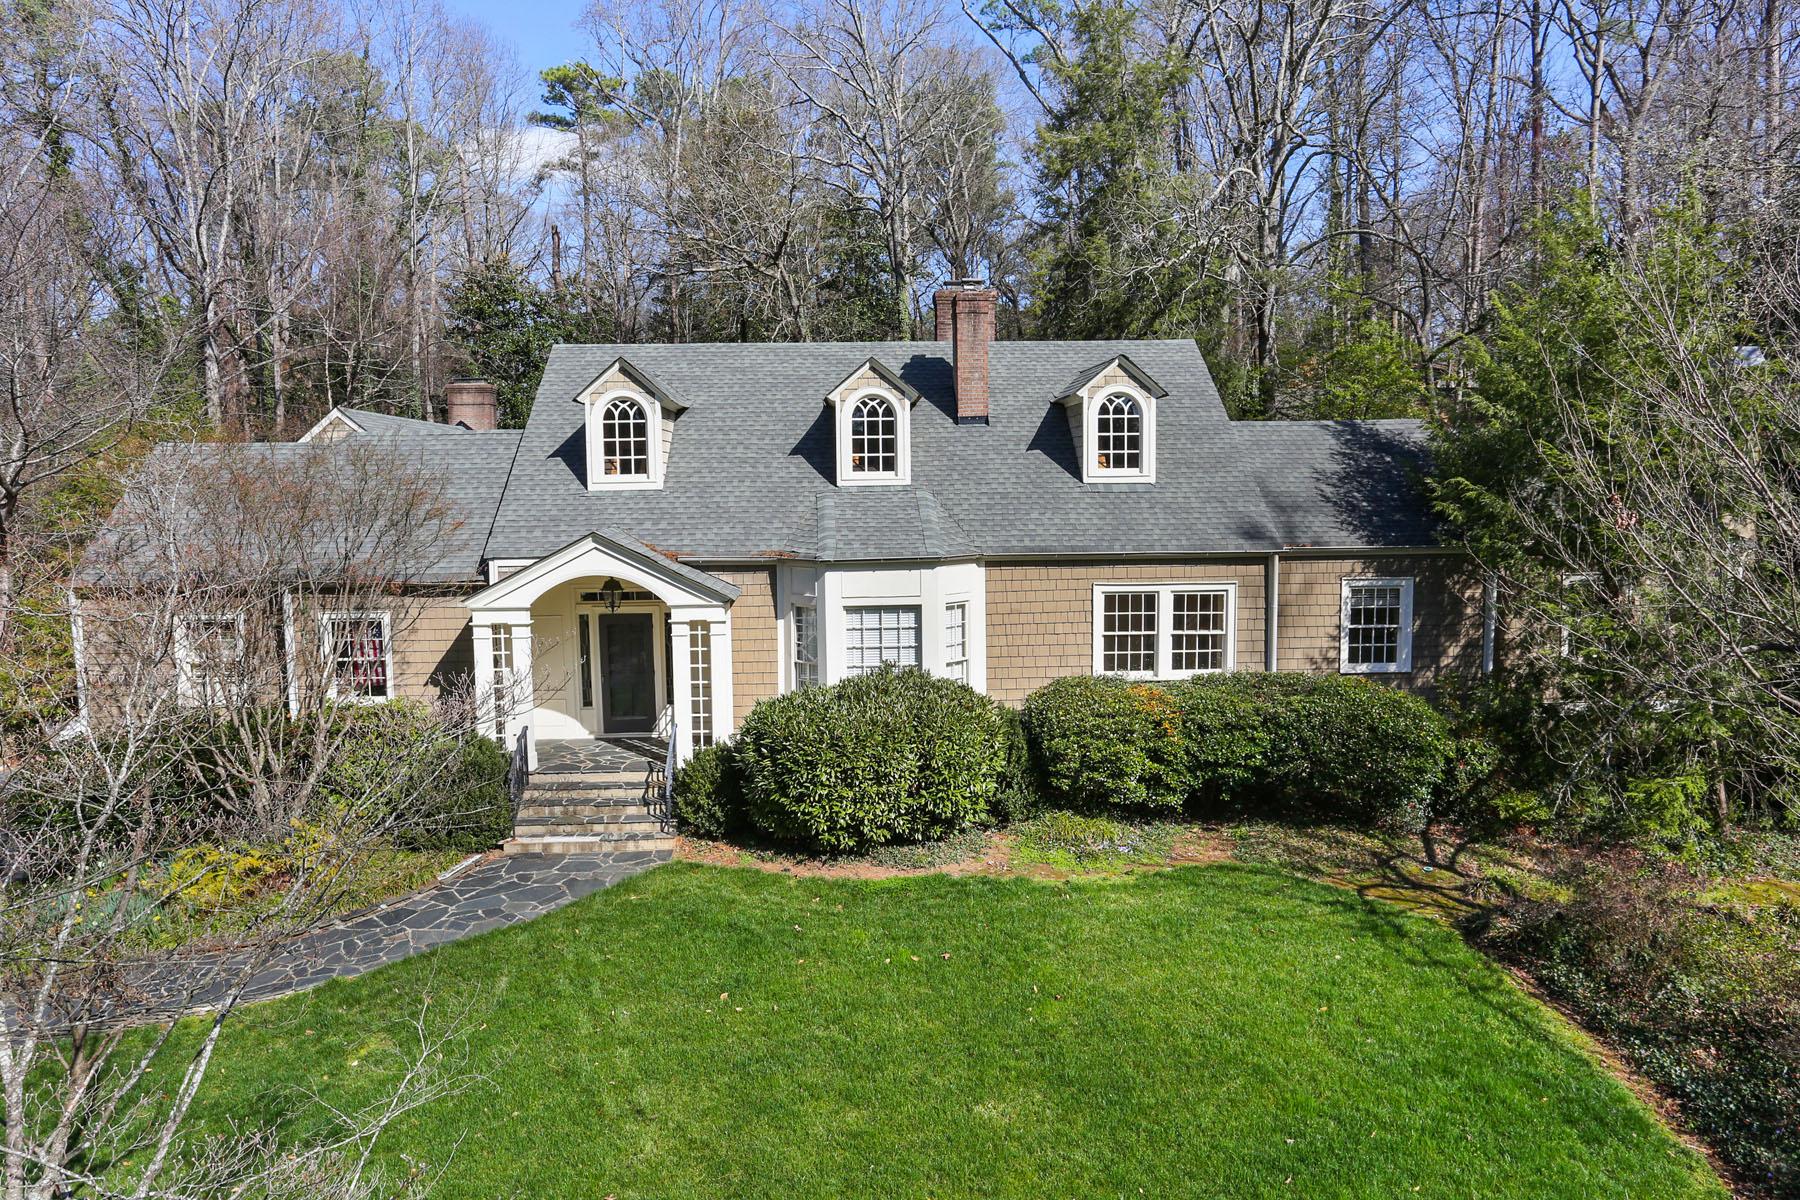 Villa per Vendita alle ore Charming Cape Cod Nestled on 1.5 Acre Lot 1225 West Wesley Rd Buckhead, Atlanta, Georgia, 30327 Stati Uniti